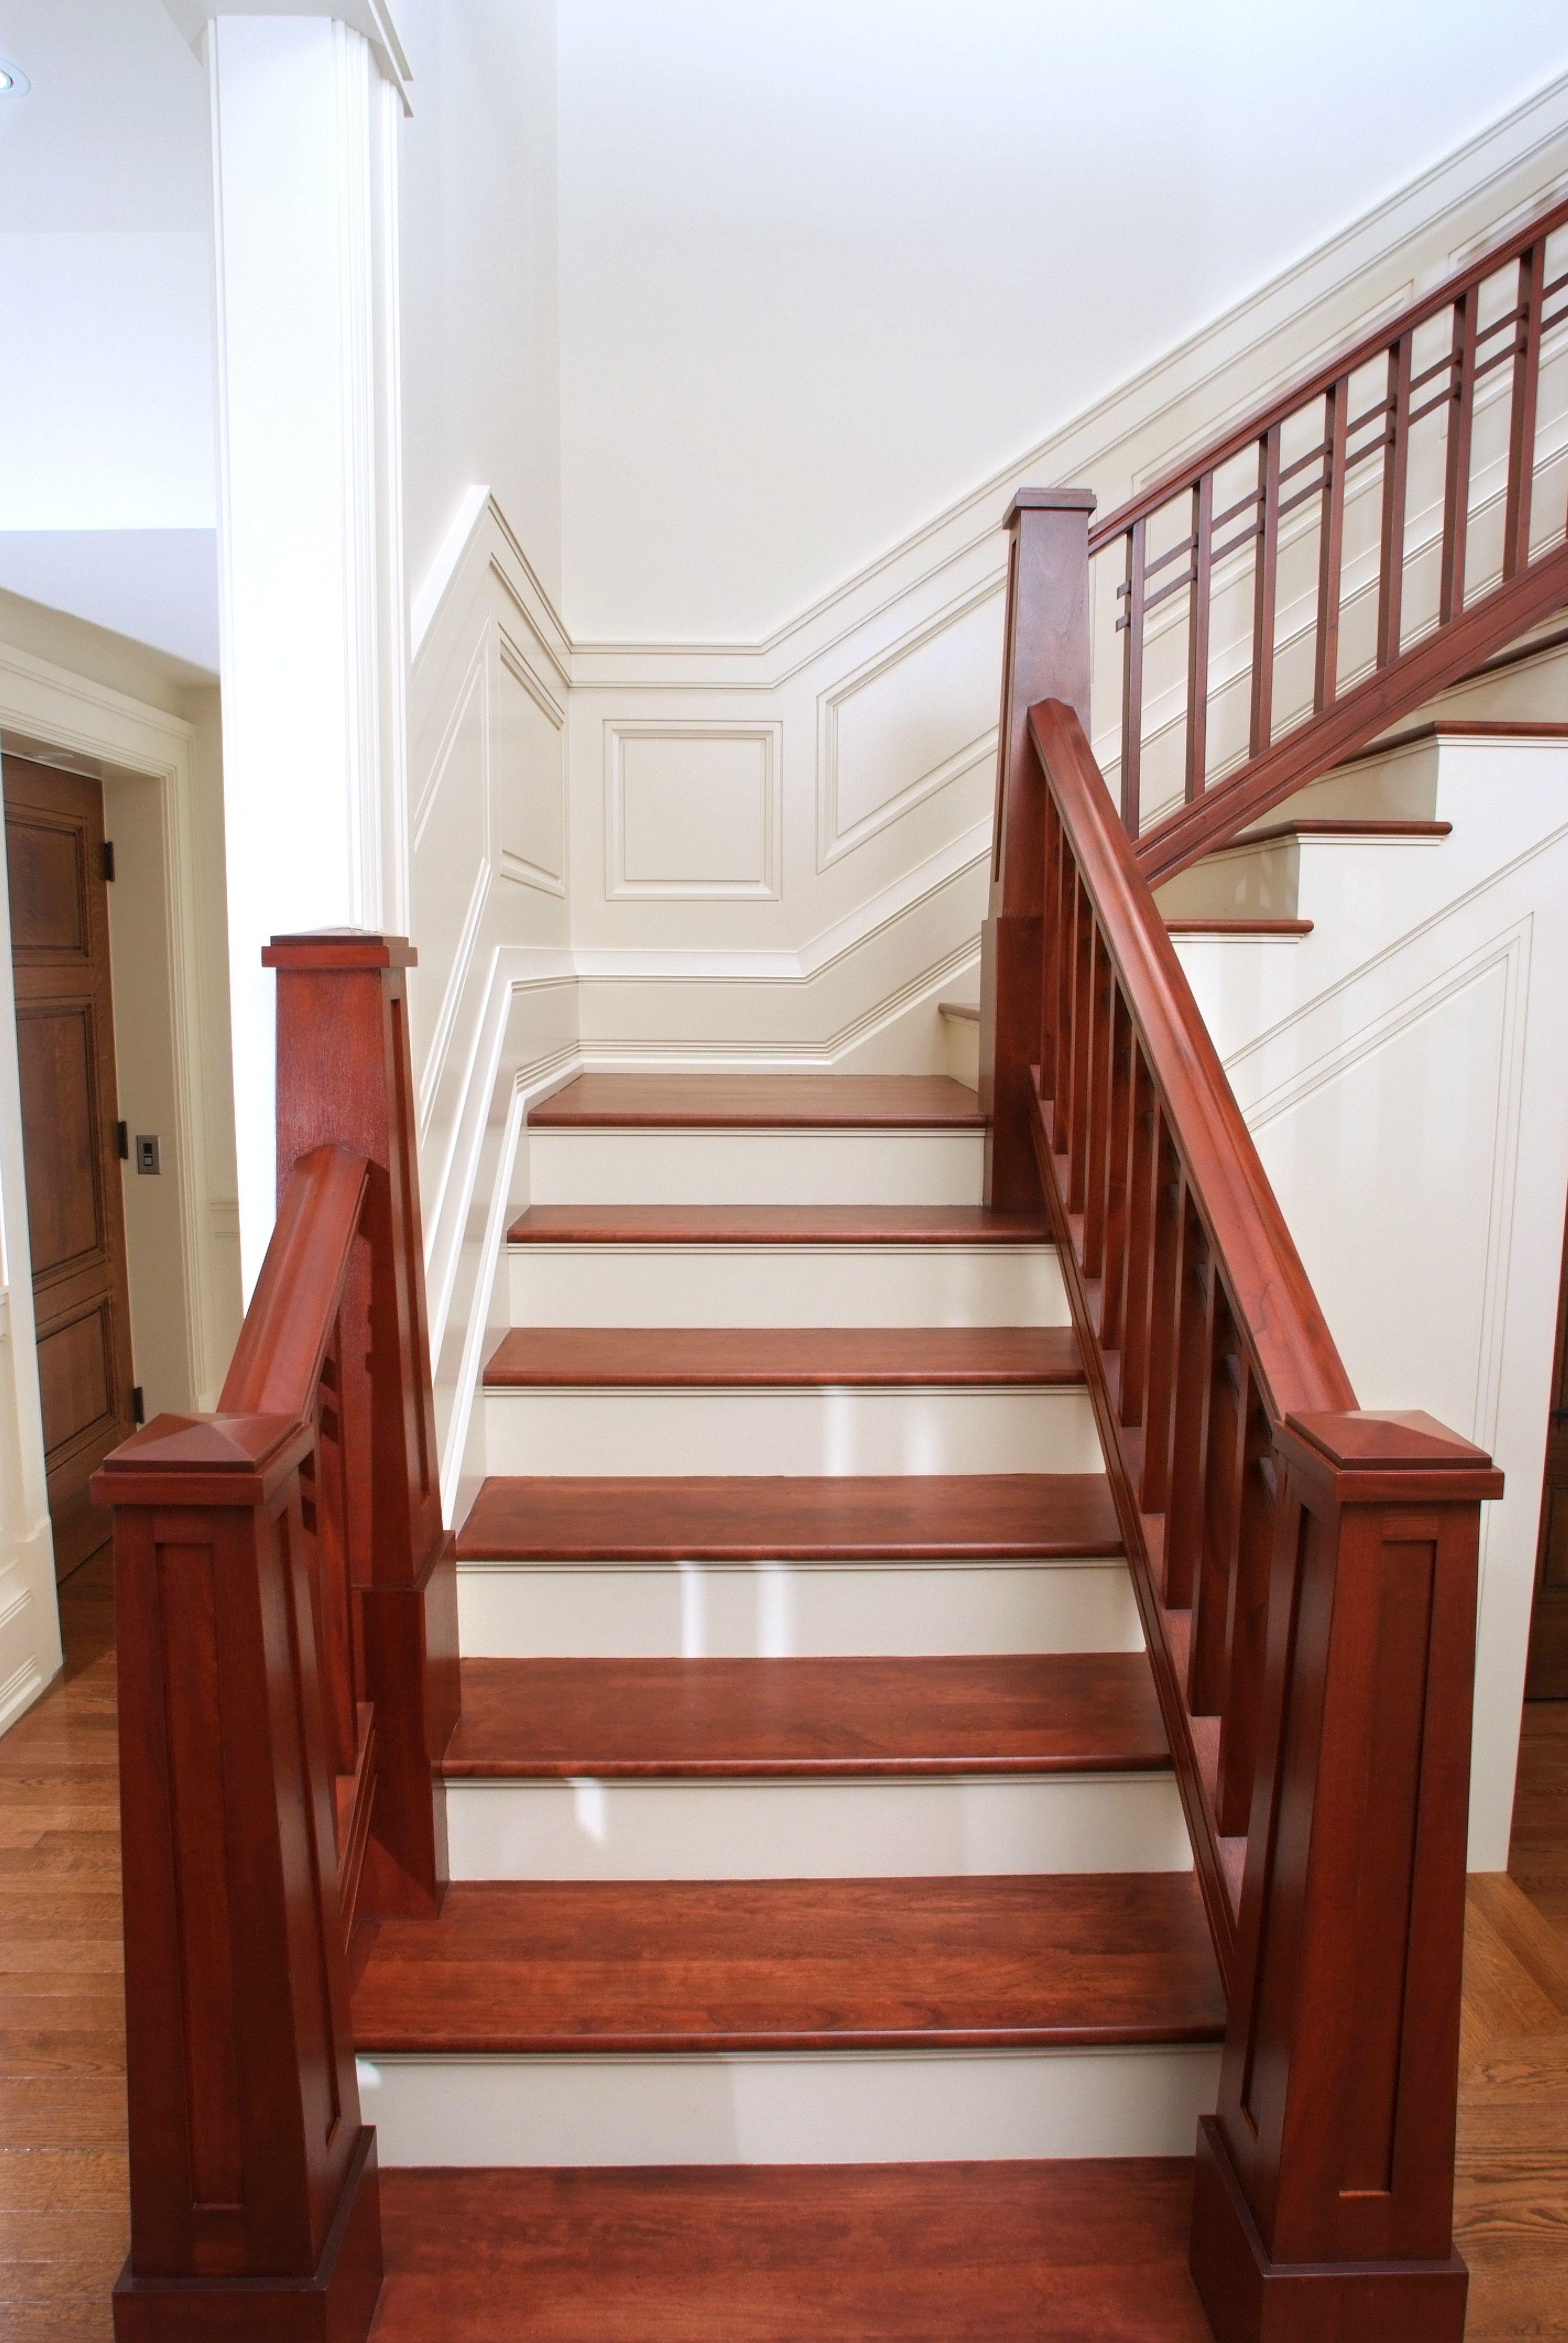 Custom Craftsman Mahogany Handrail And Newel Post With